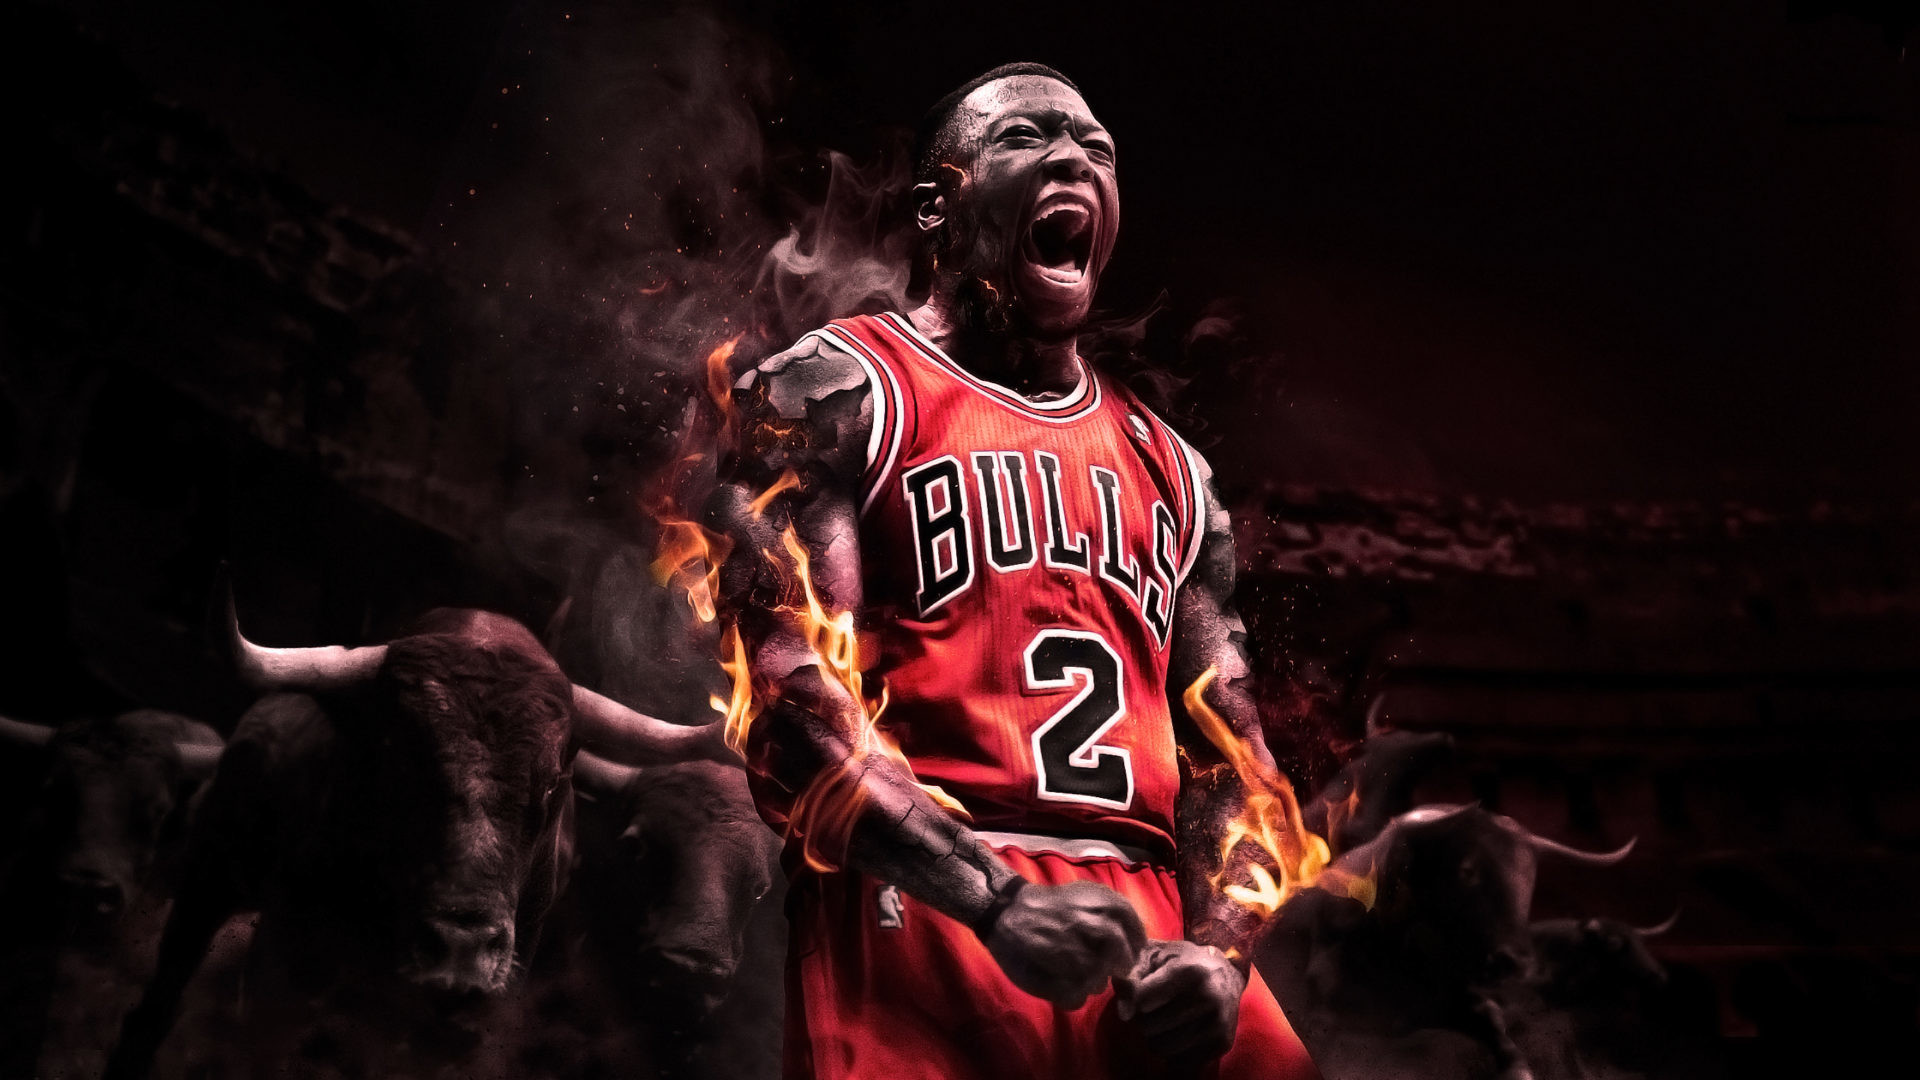 Chicago Bulls Players Wallpaper.